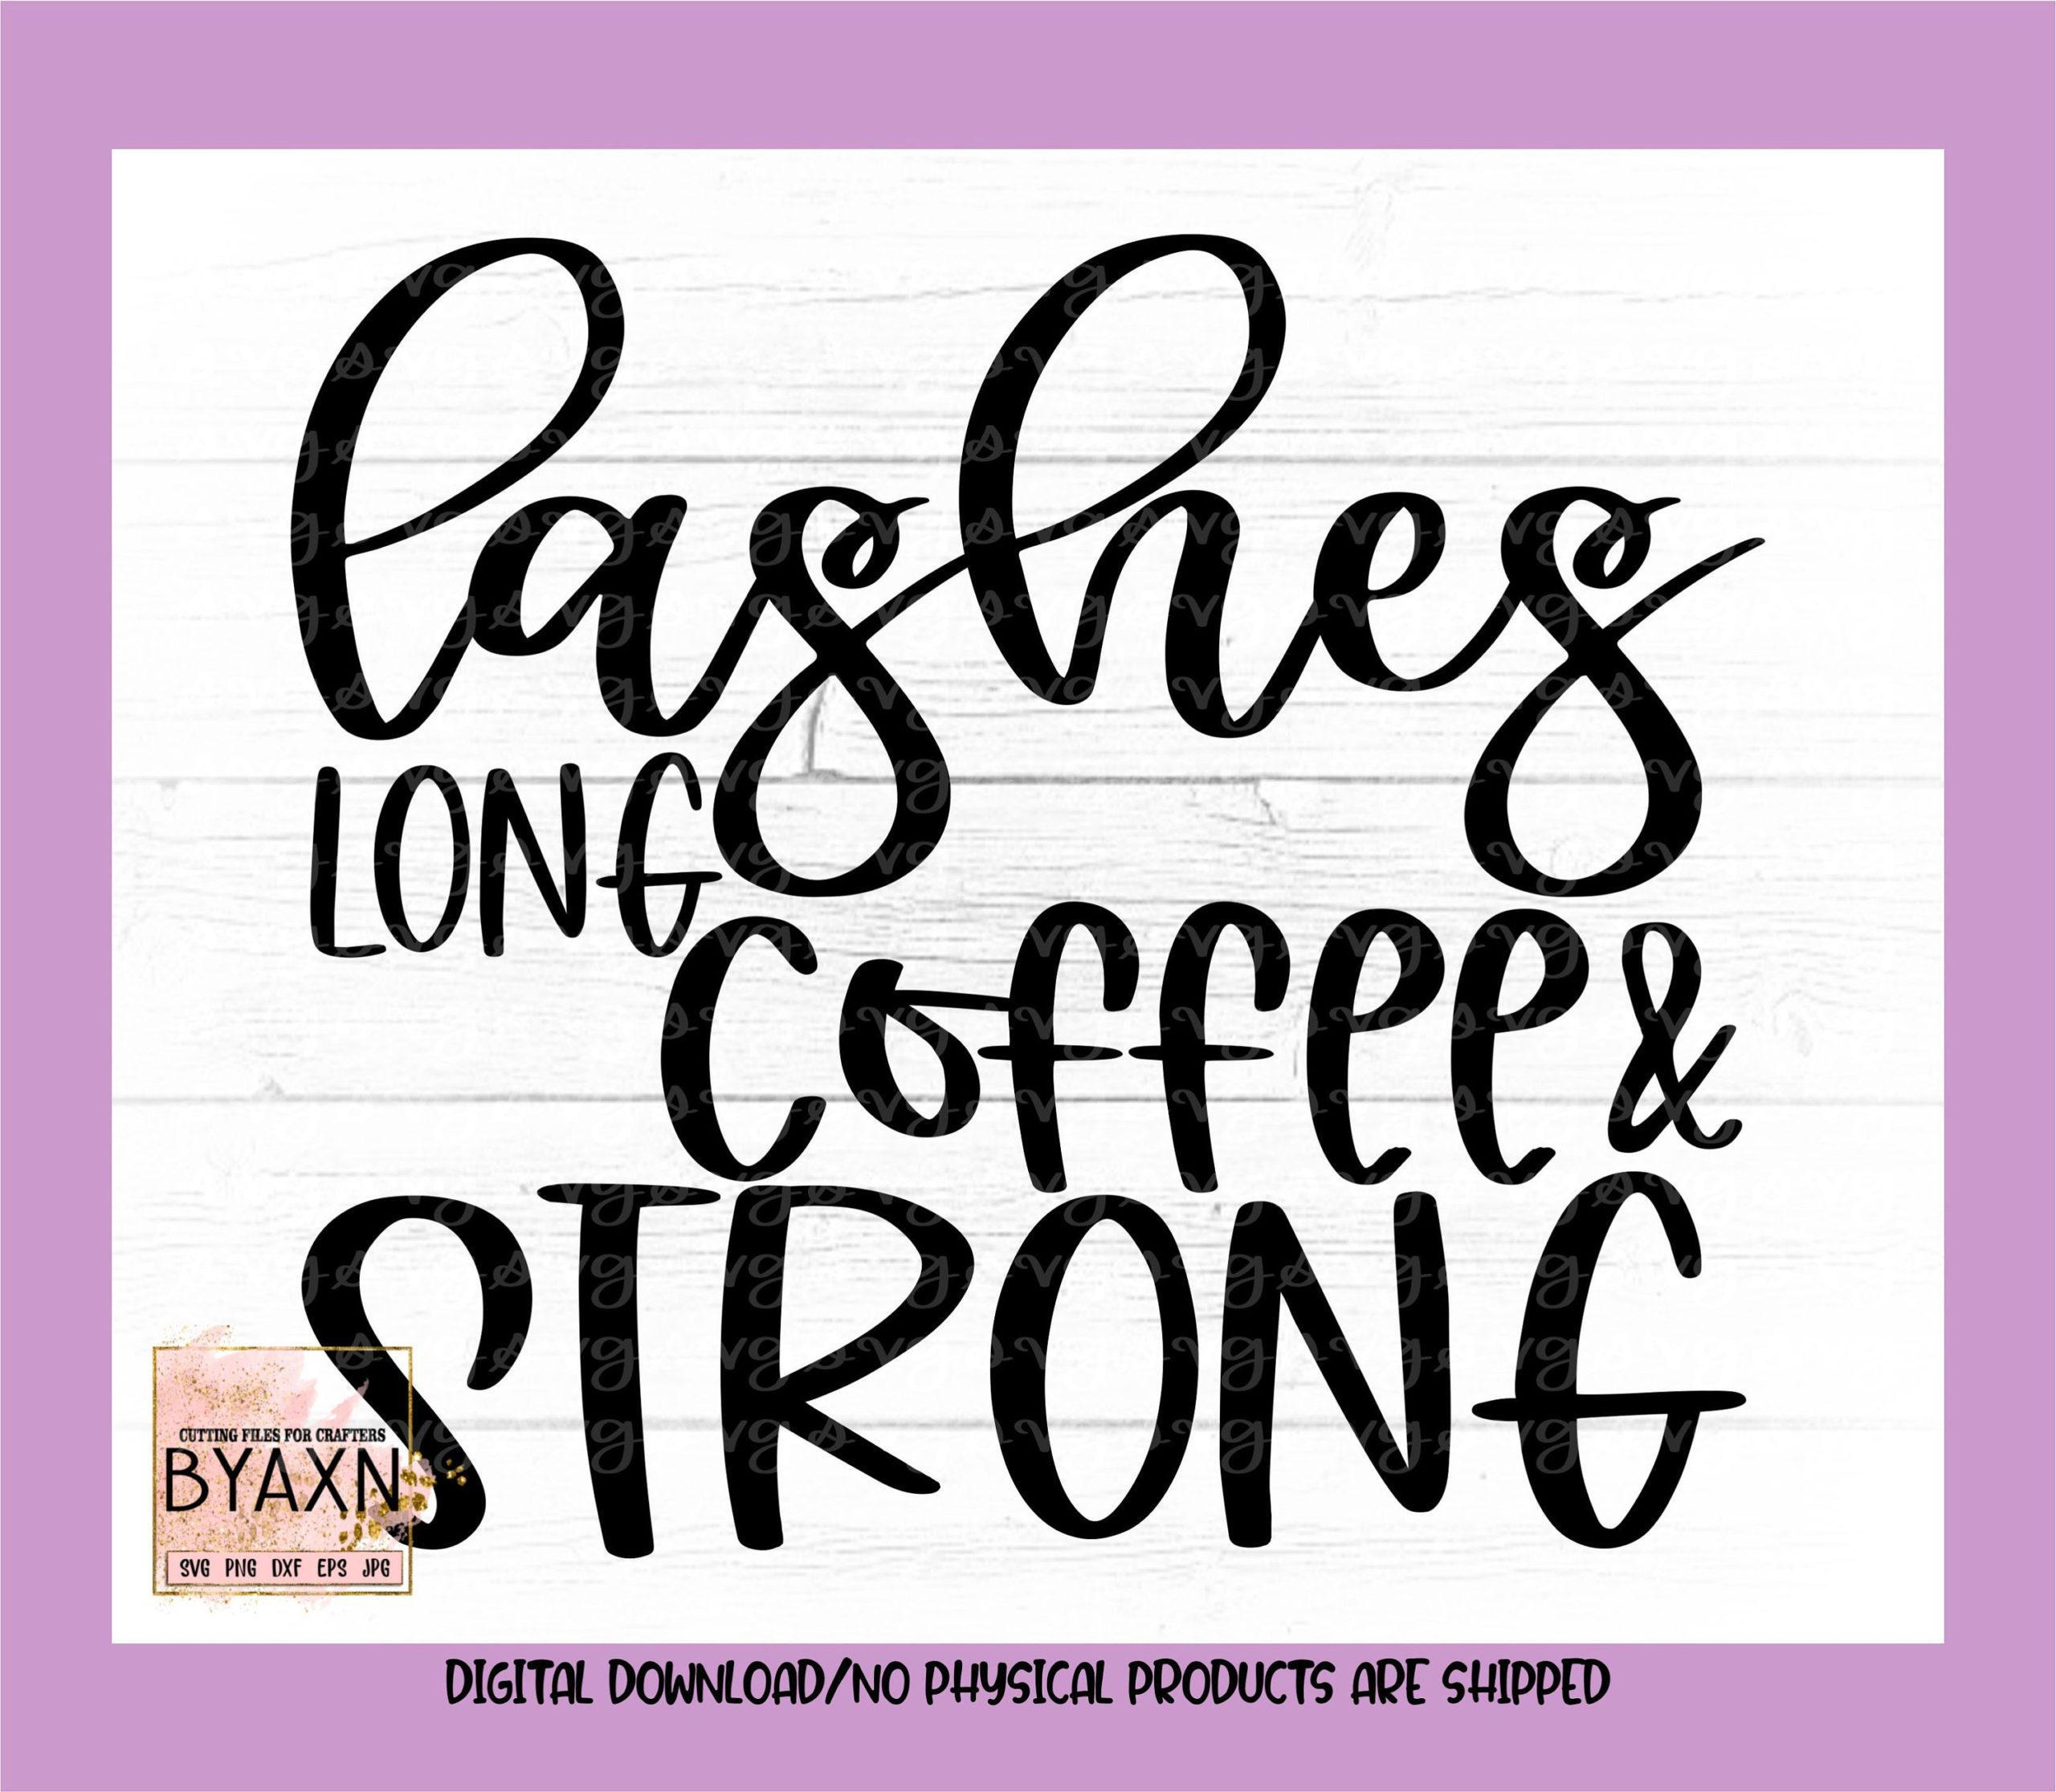 Make-up-svg-lashes-long-coffee-strong-svg-makeup-coffee-svg-lashes-svg-mascara-svg-makeup-svg-design-makeup-cut-file-cricut-svg-60514ca6